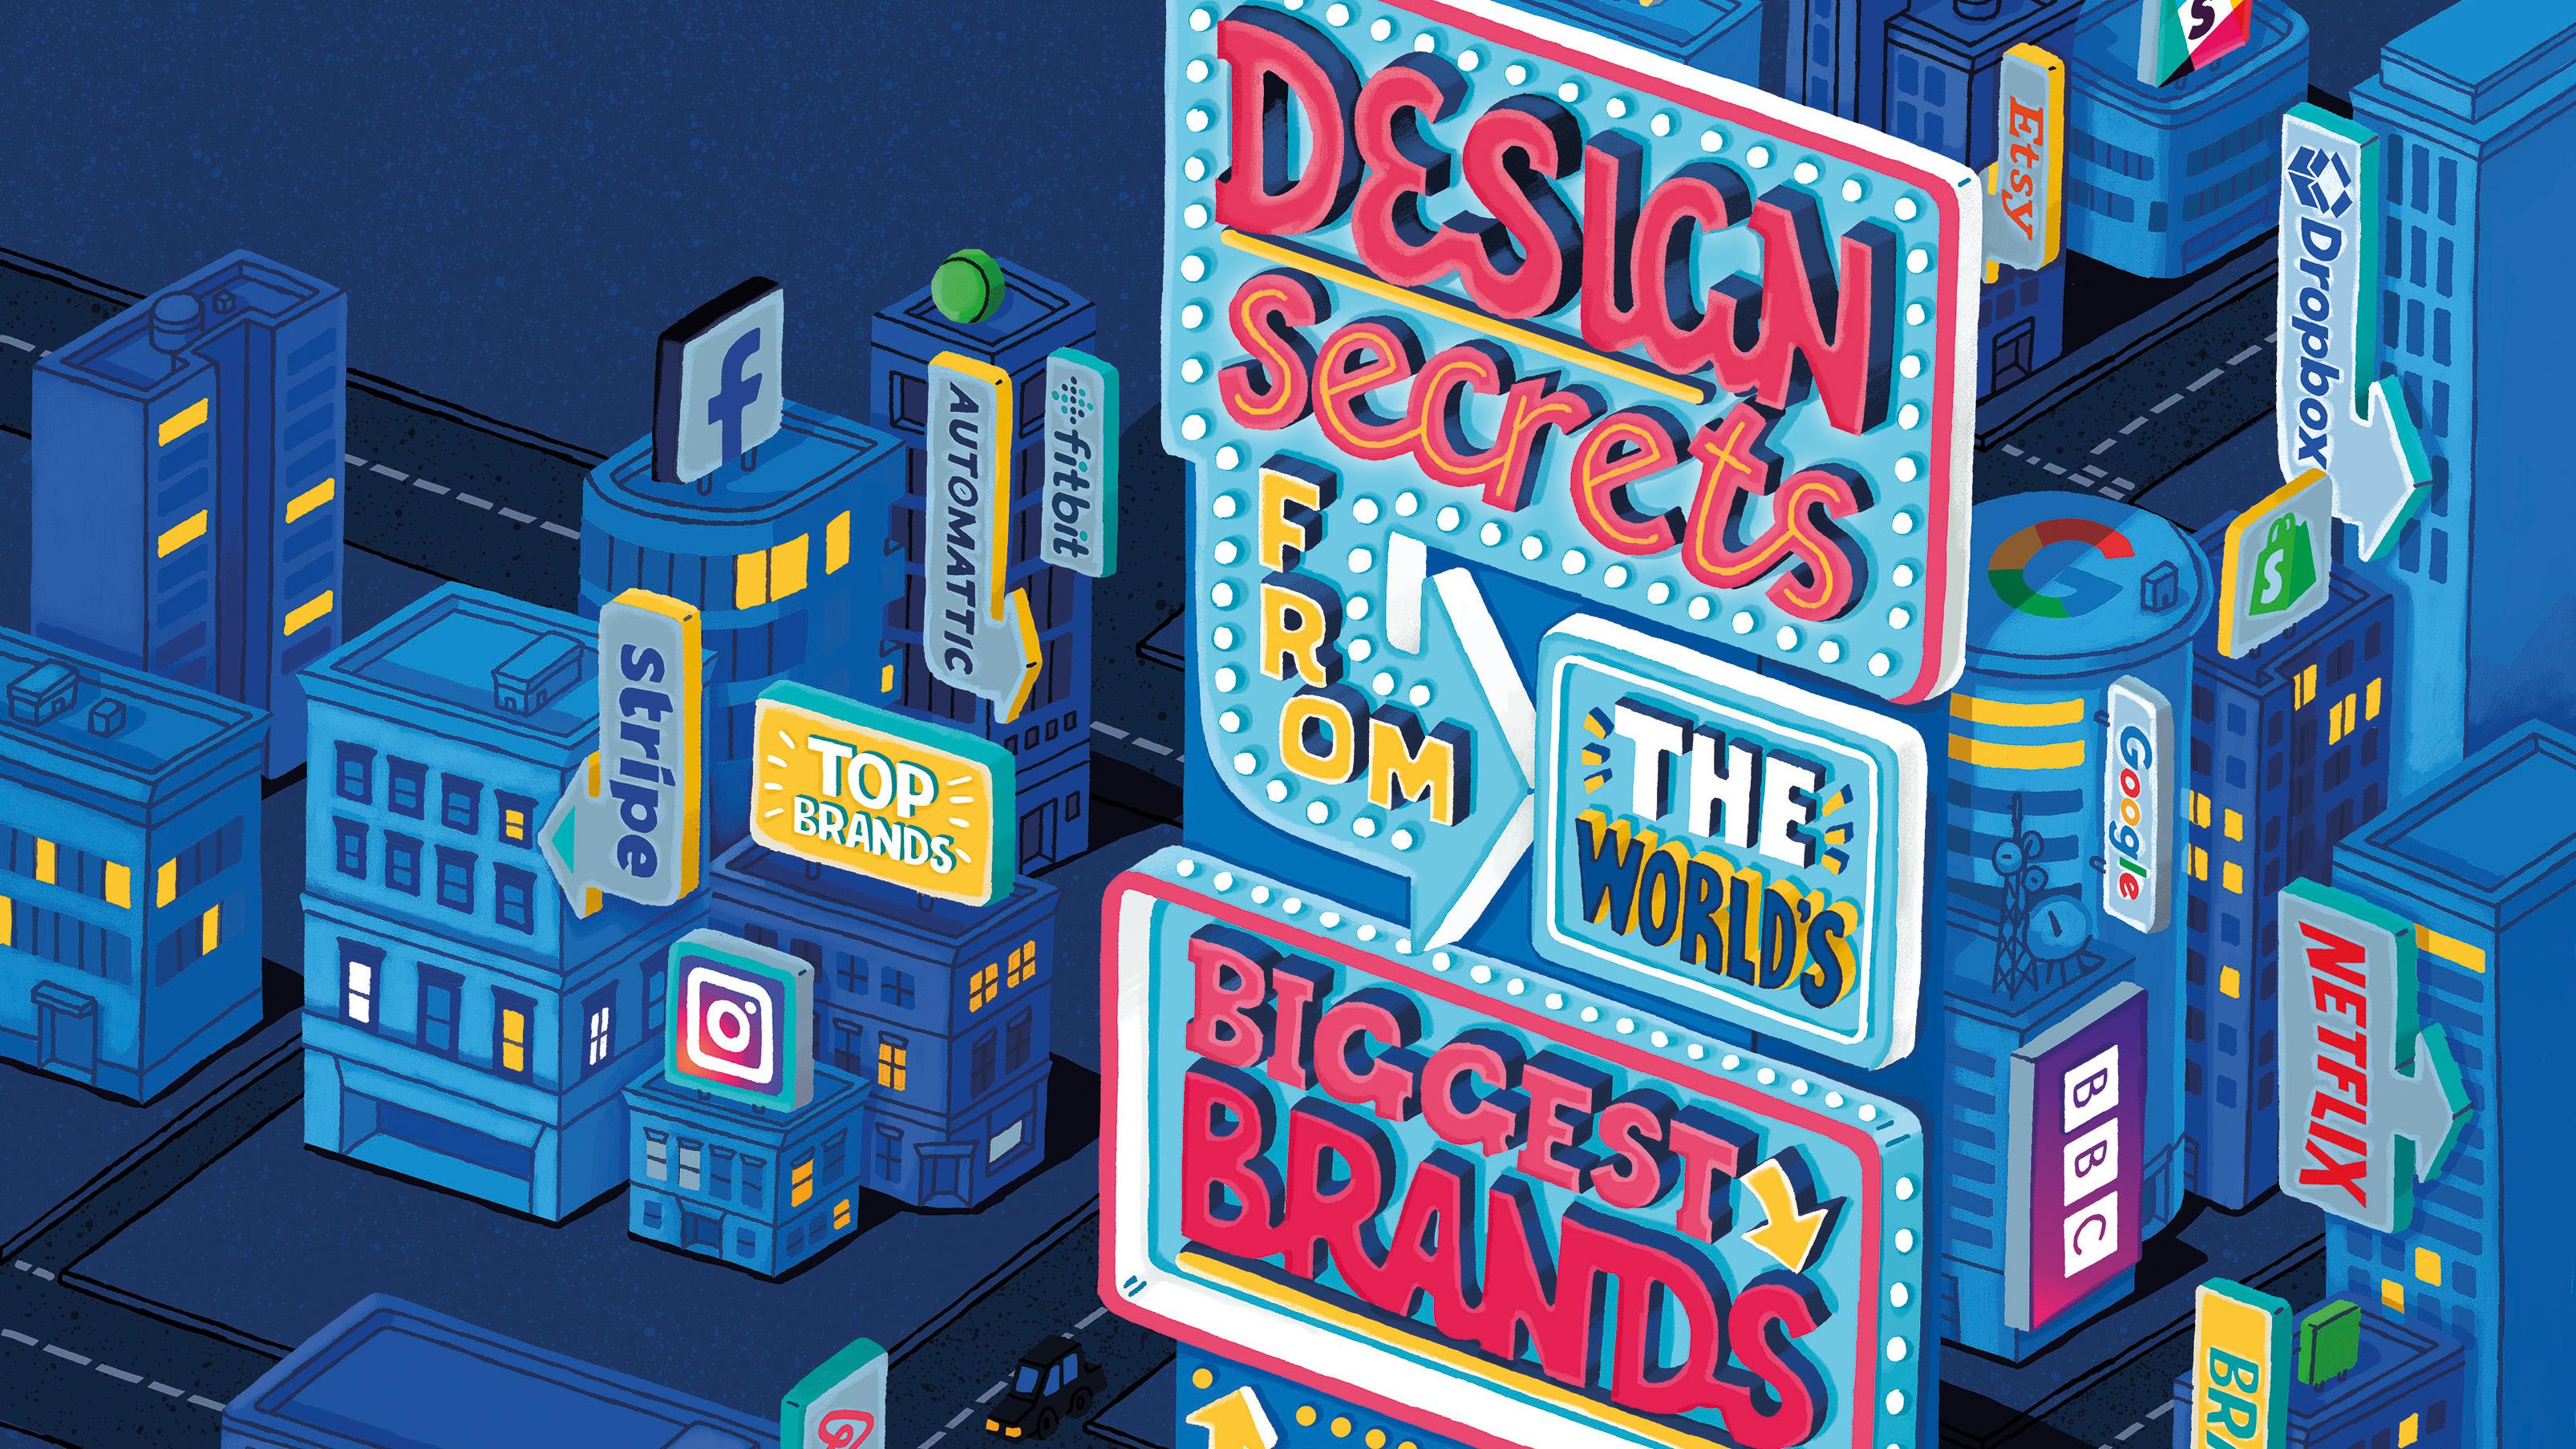 15 web design secrets from the world's biggest brands